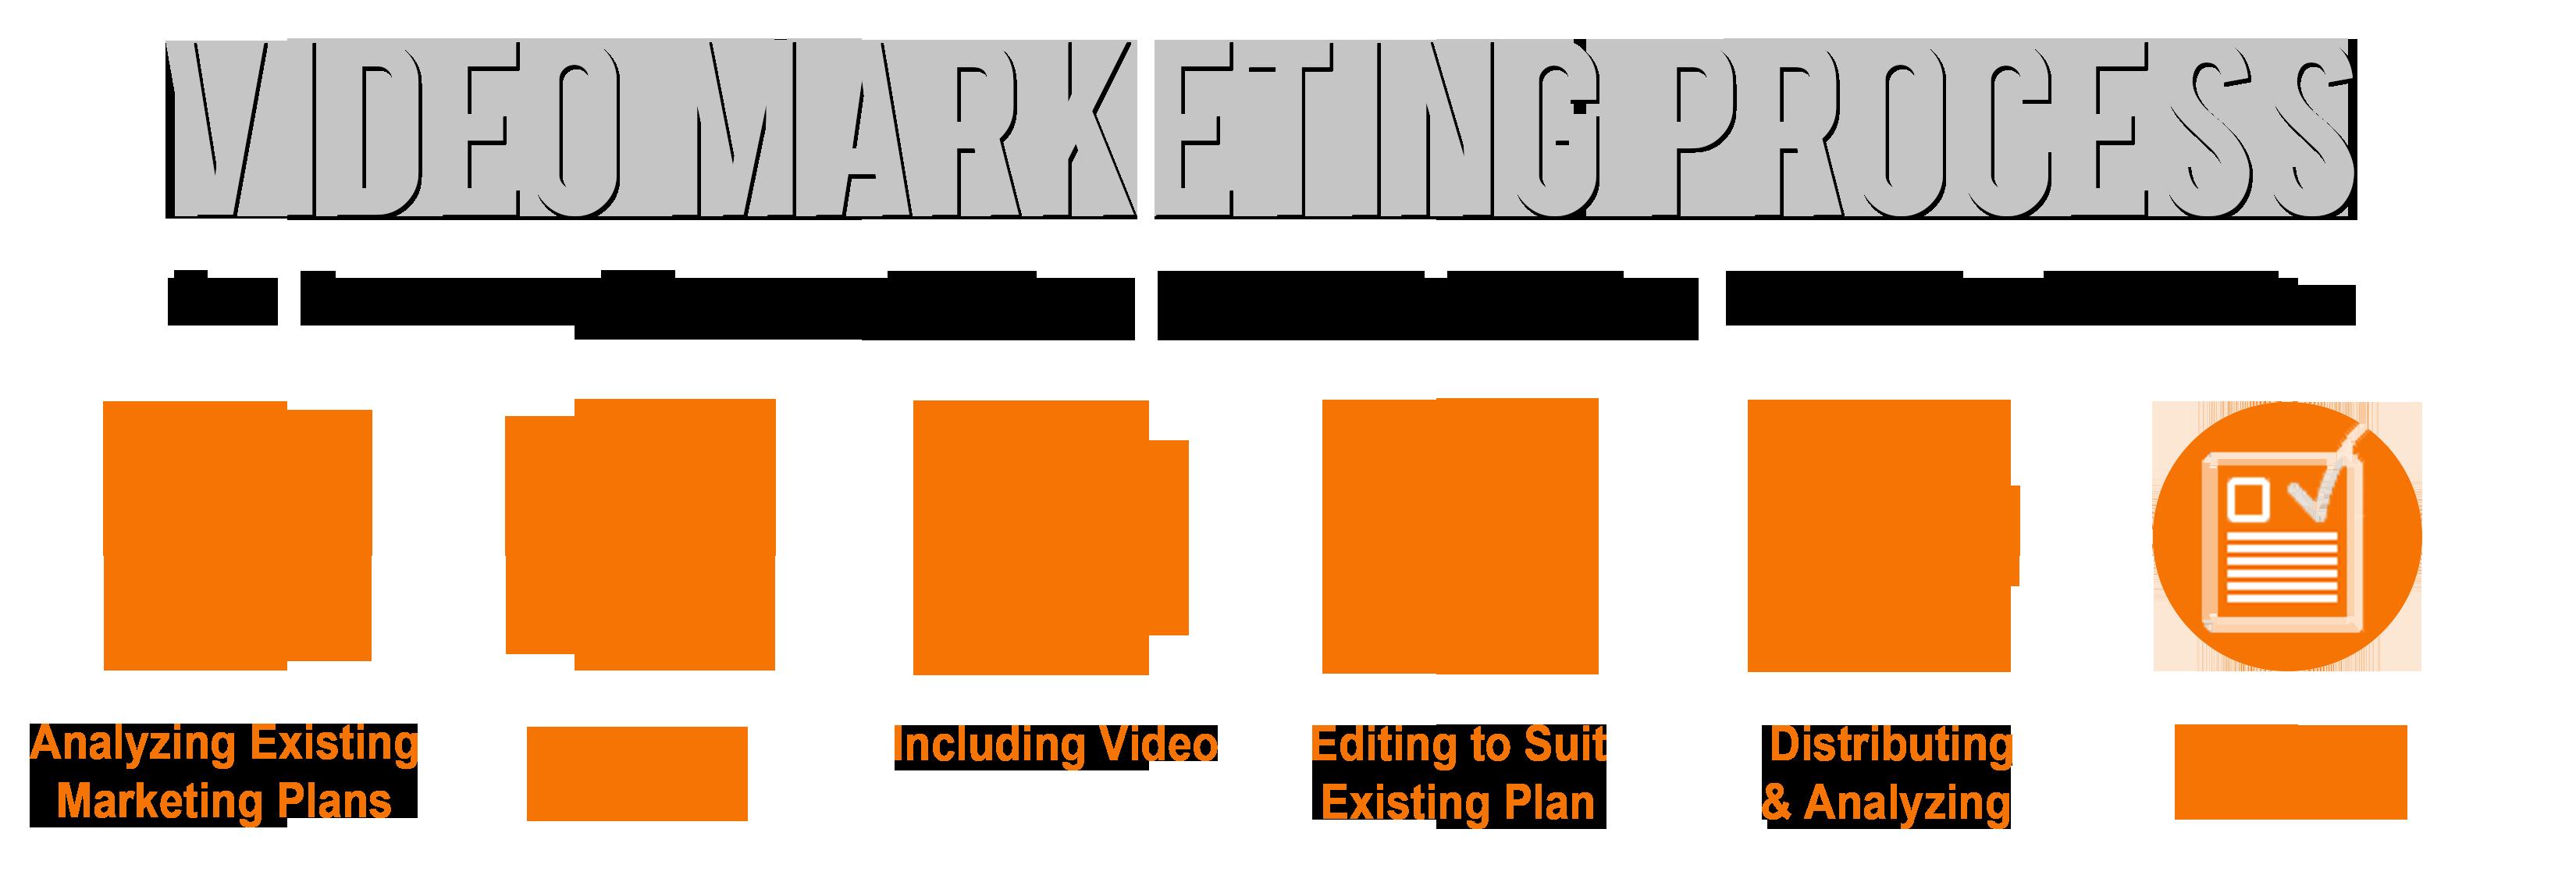 6-step-video marketing process 2017 video marketing sri lanka 2017